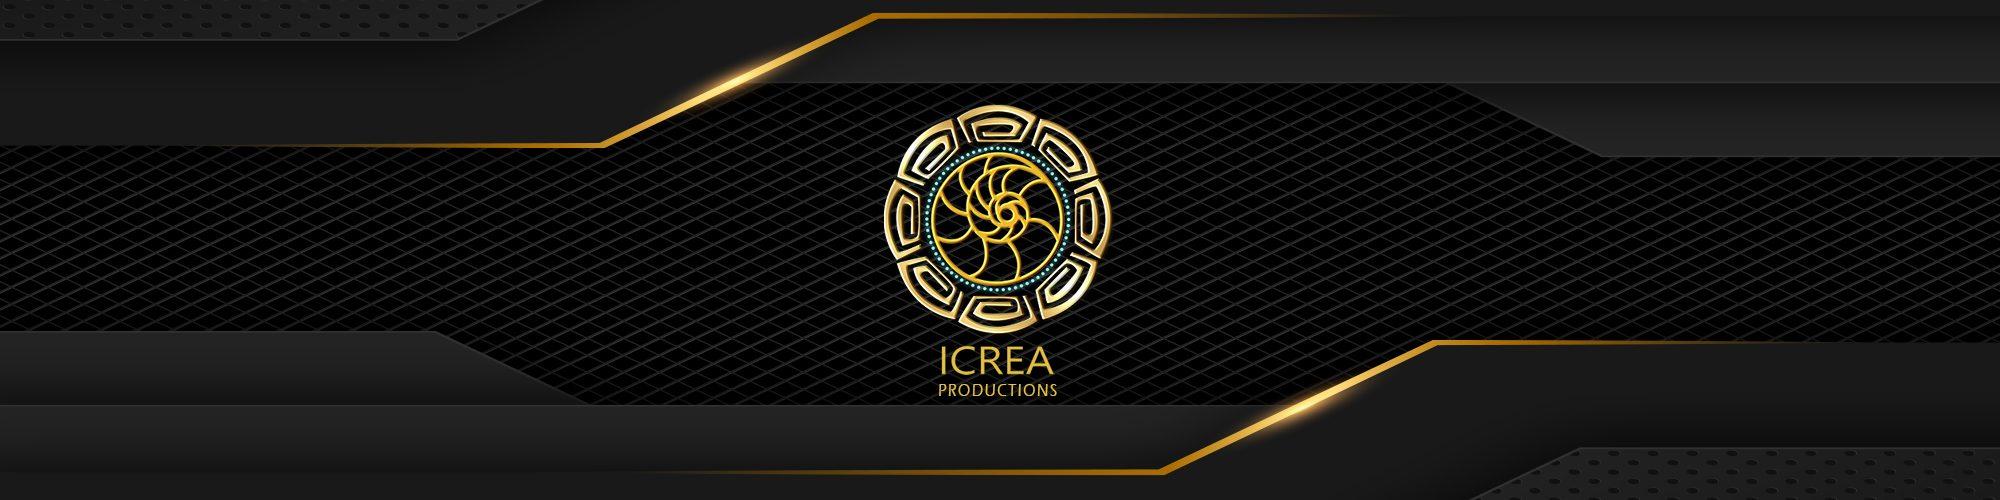 ICREA Banner2